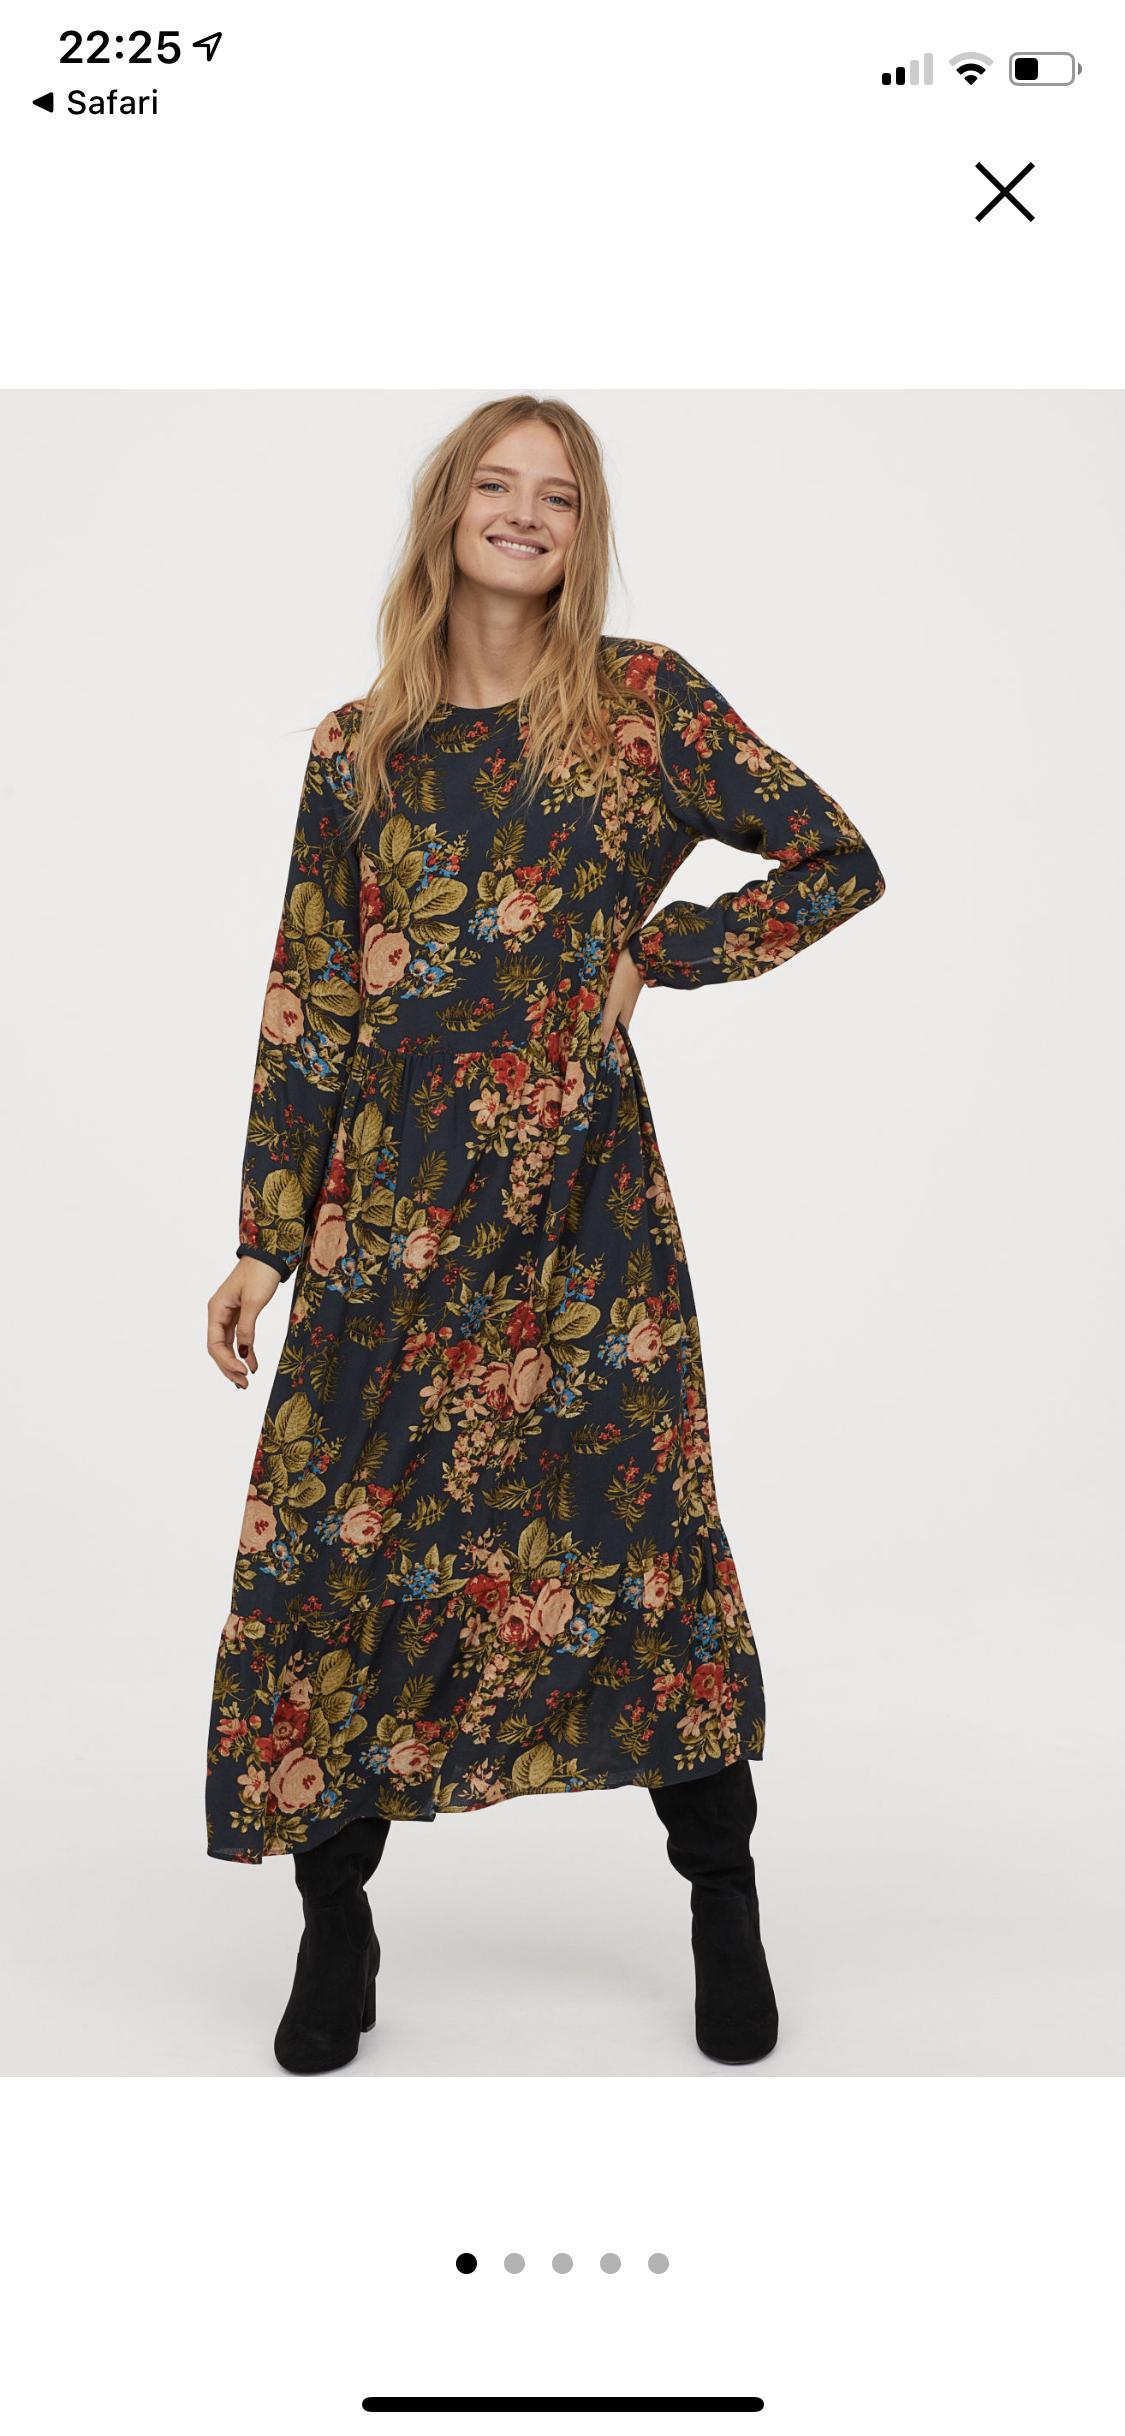 Photo of Hm klänning